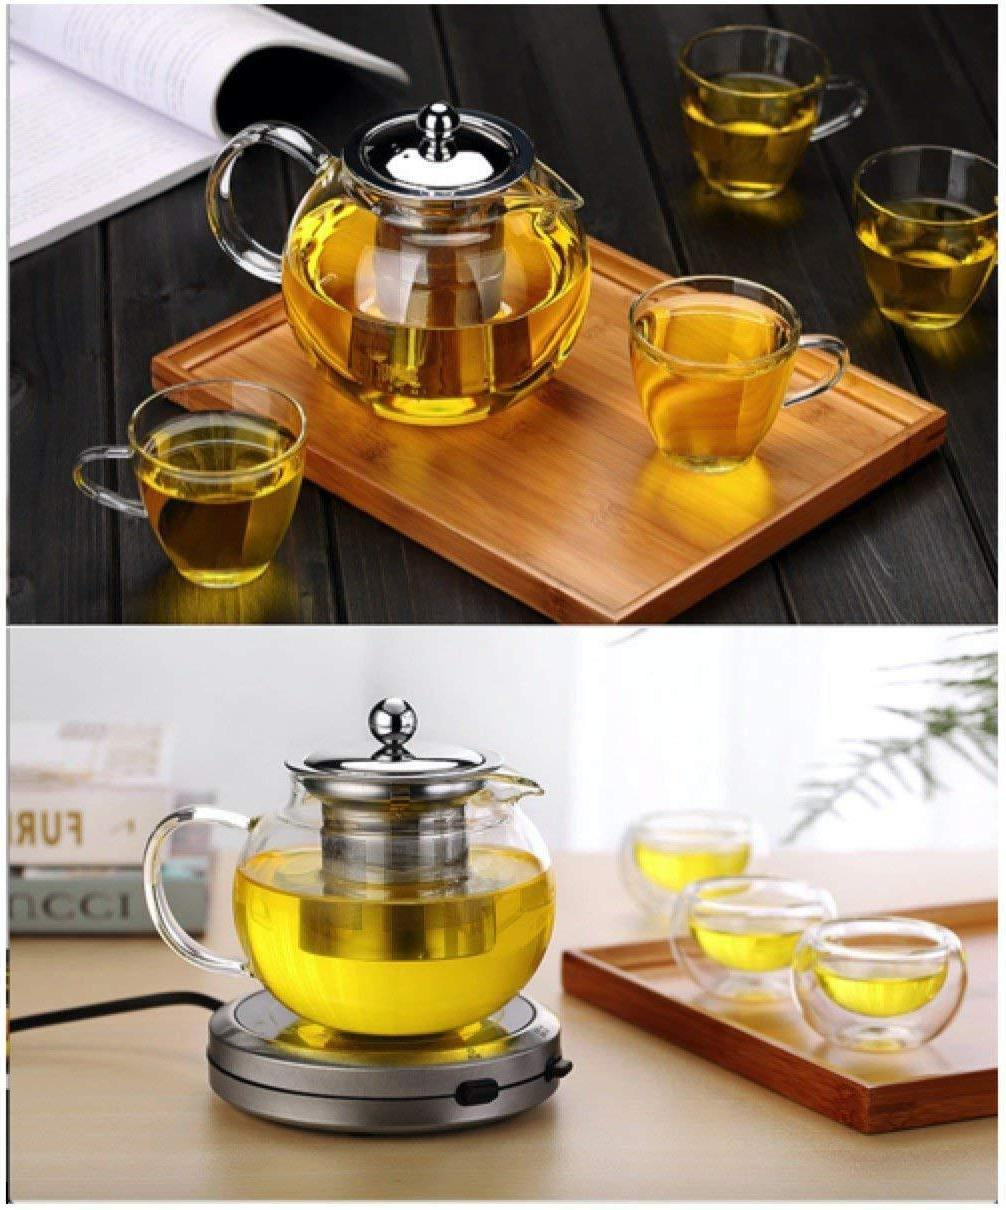 45 Oz Teapot Set Stylish Kettle For